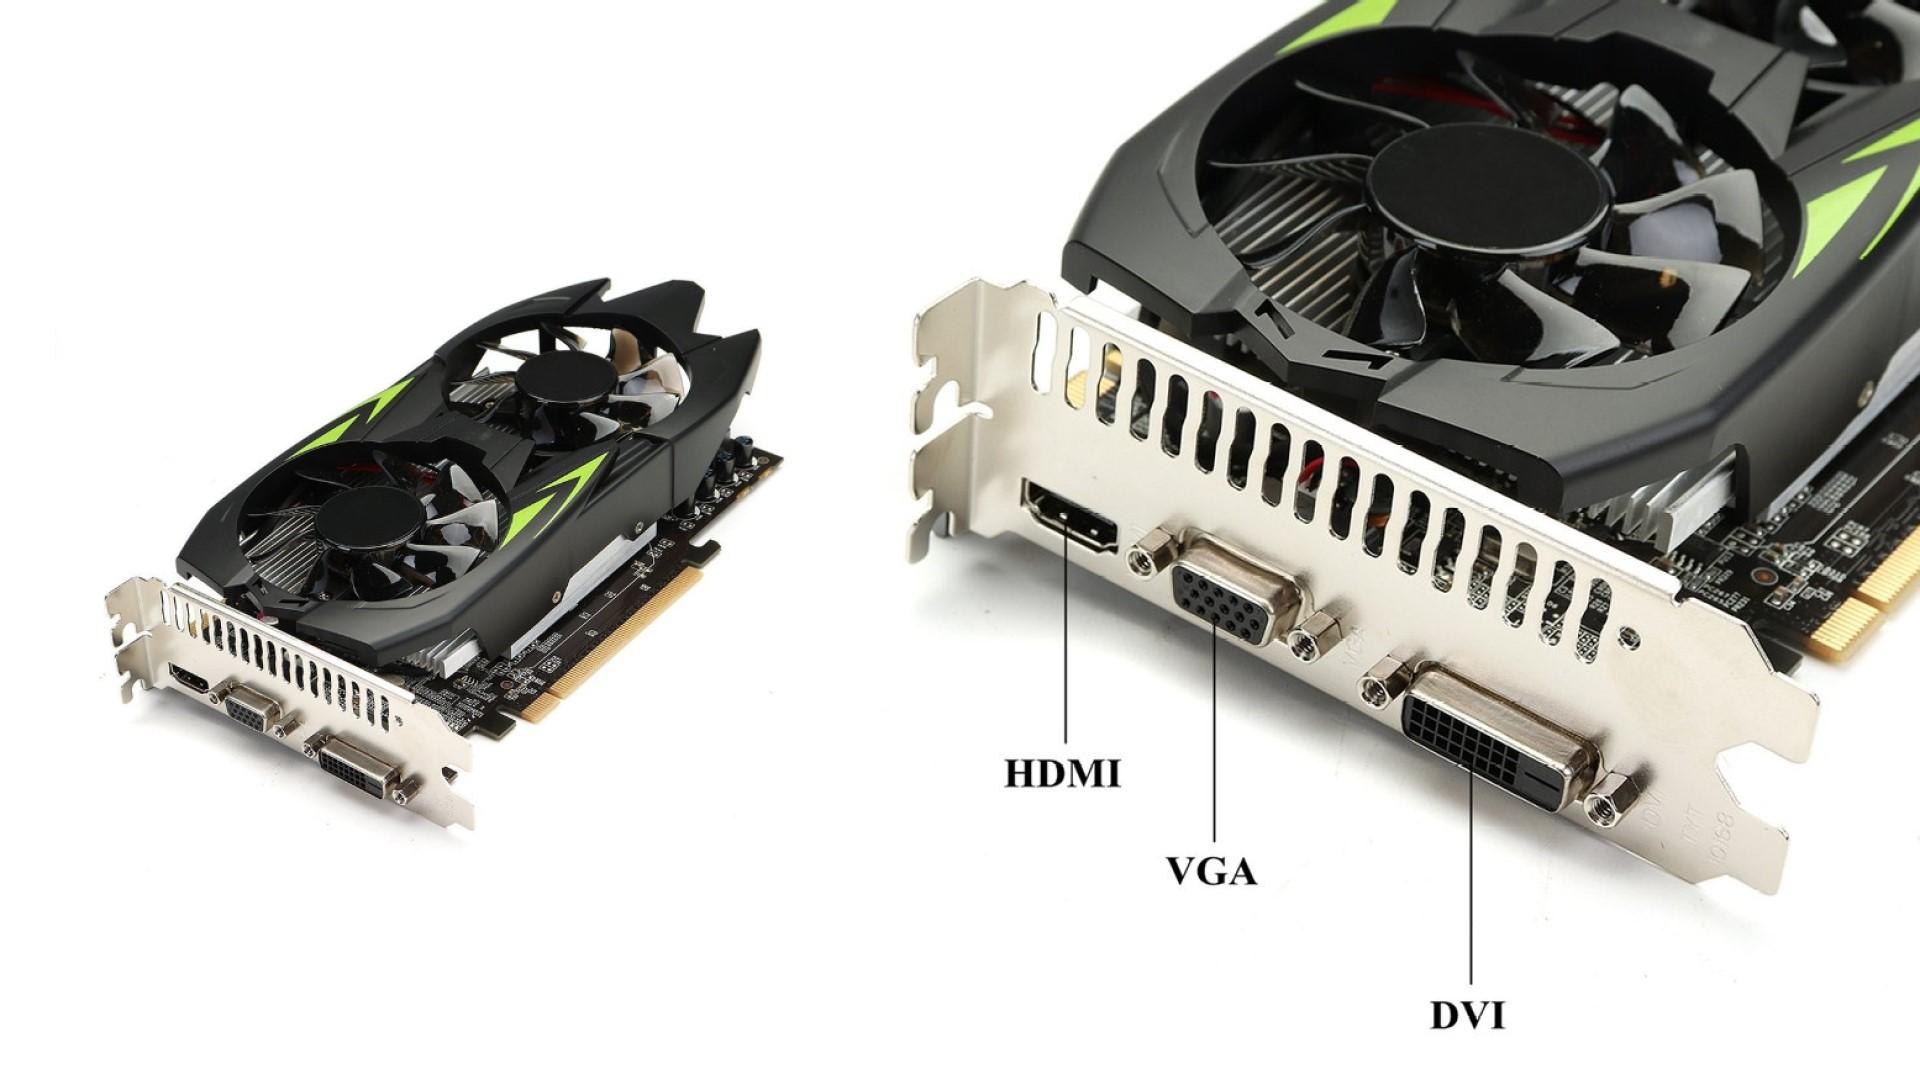 Cheap Nvidia GTX 1060 graphics cards on Ebay really are too